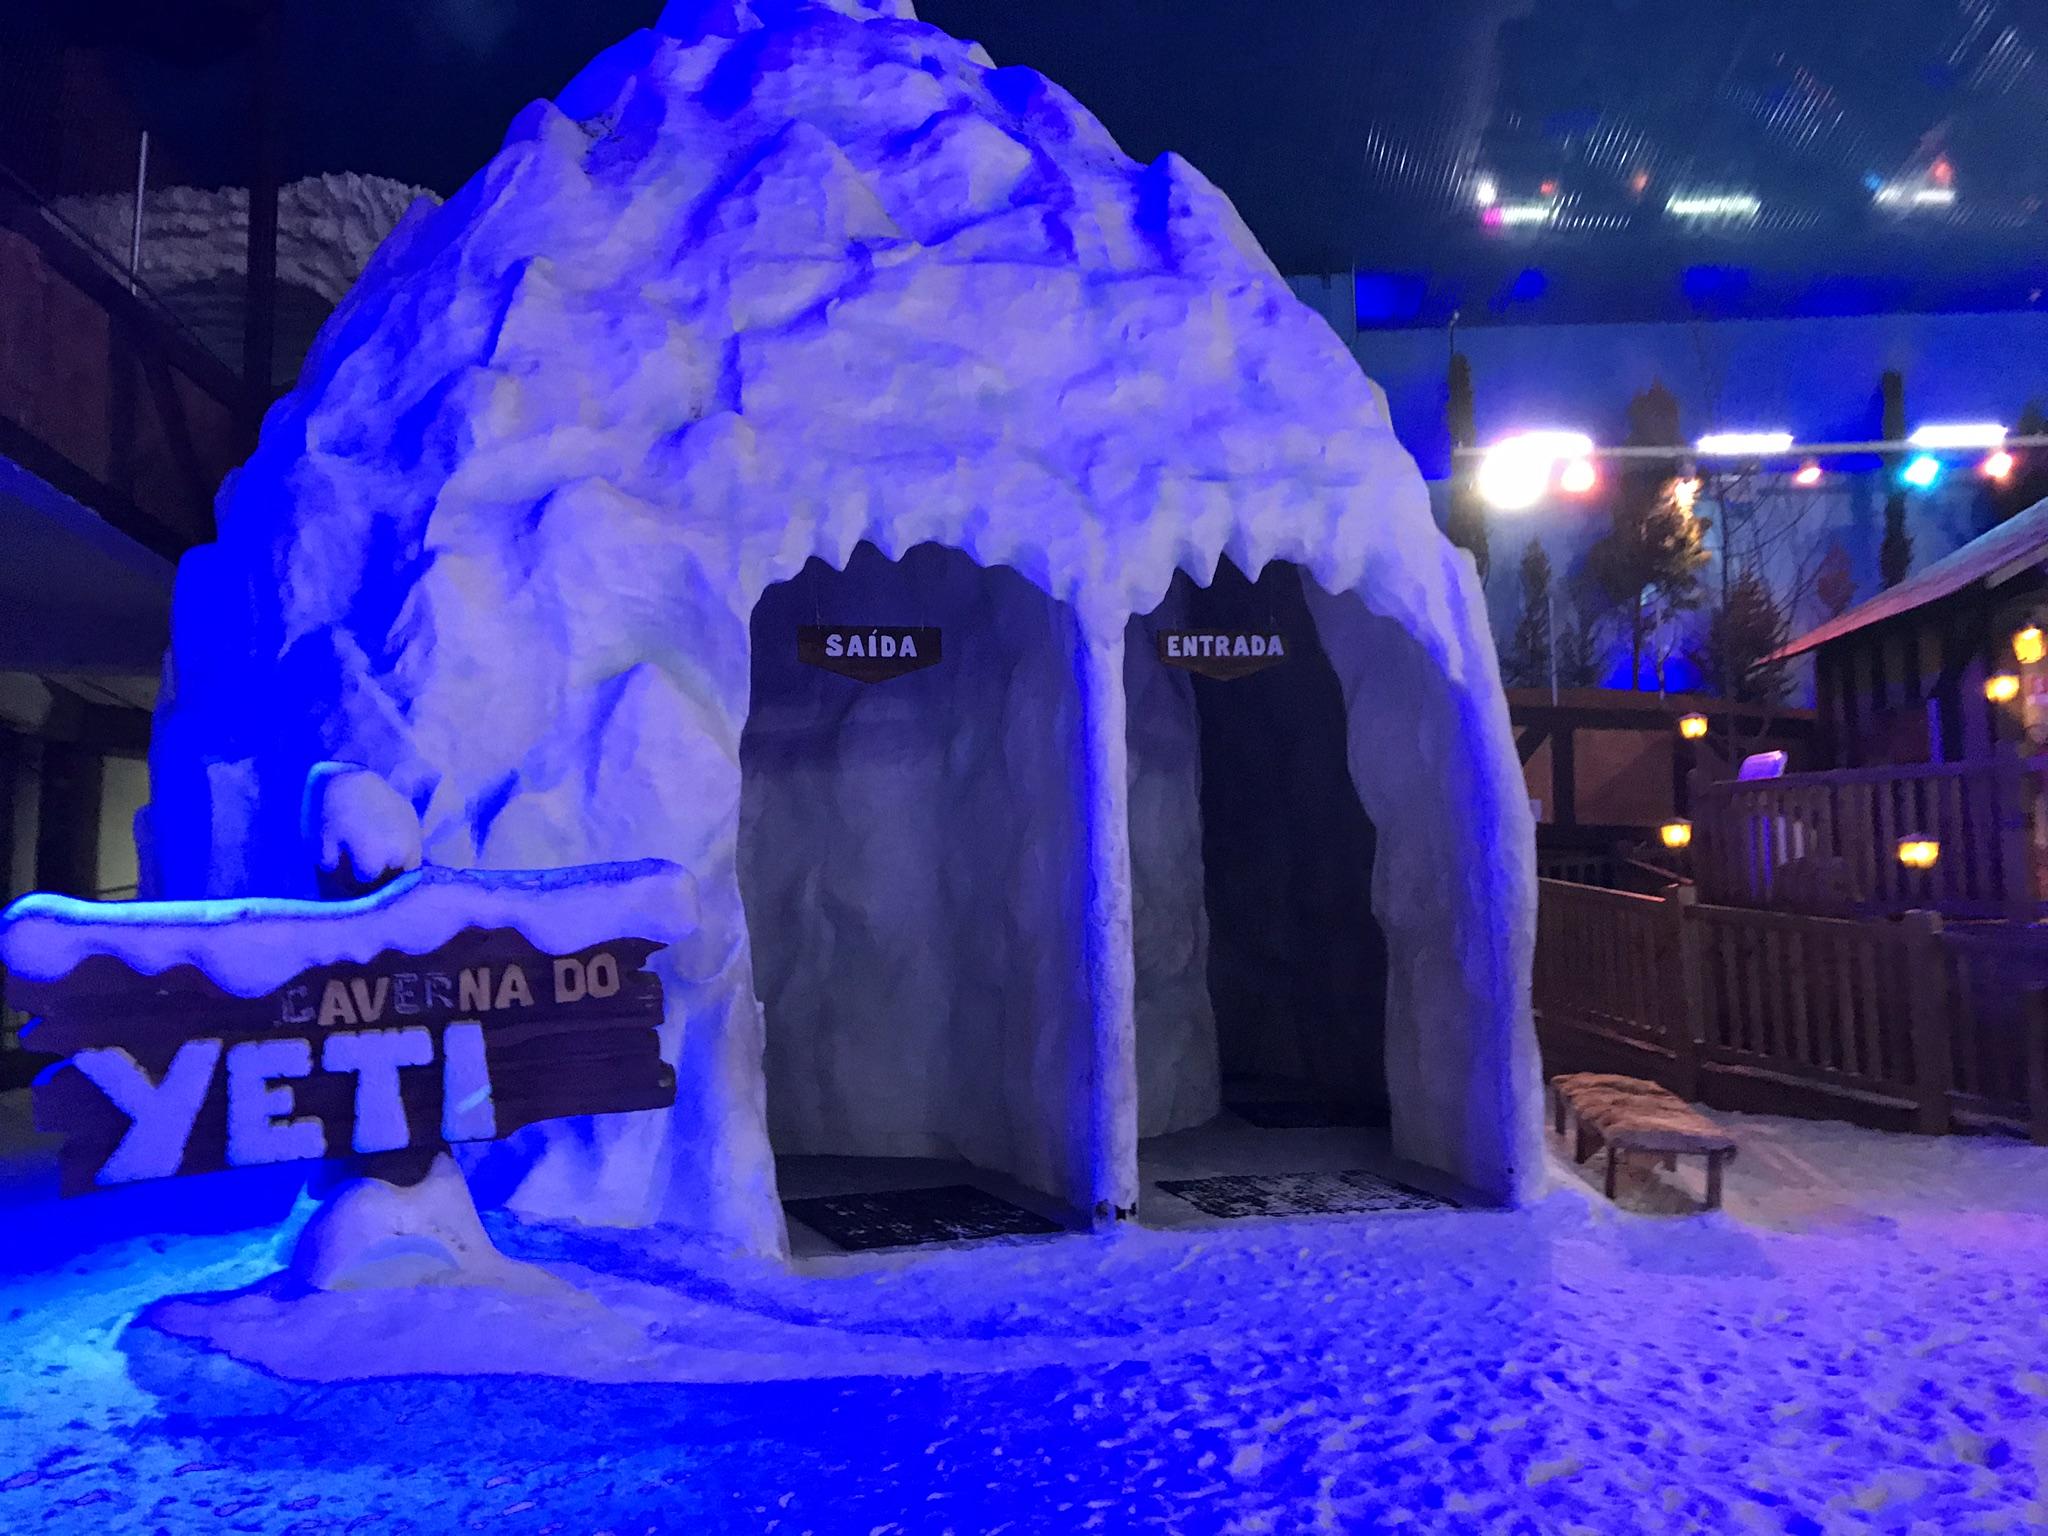 snowland night caverna do yeti